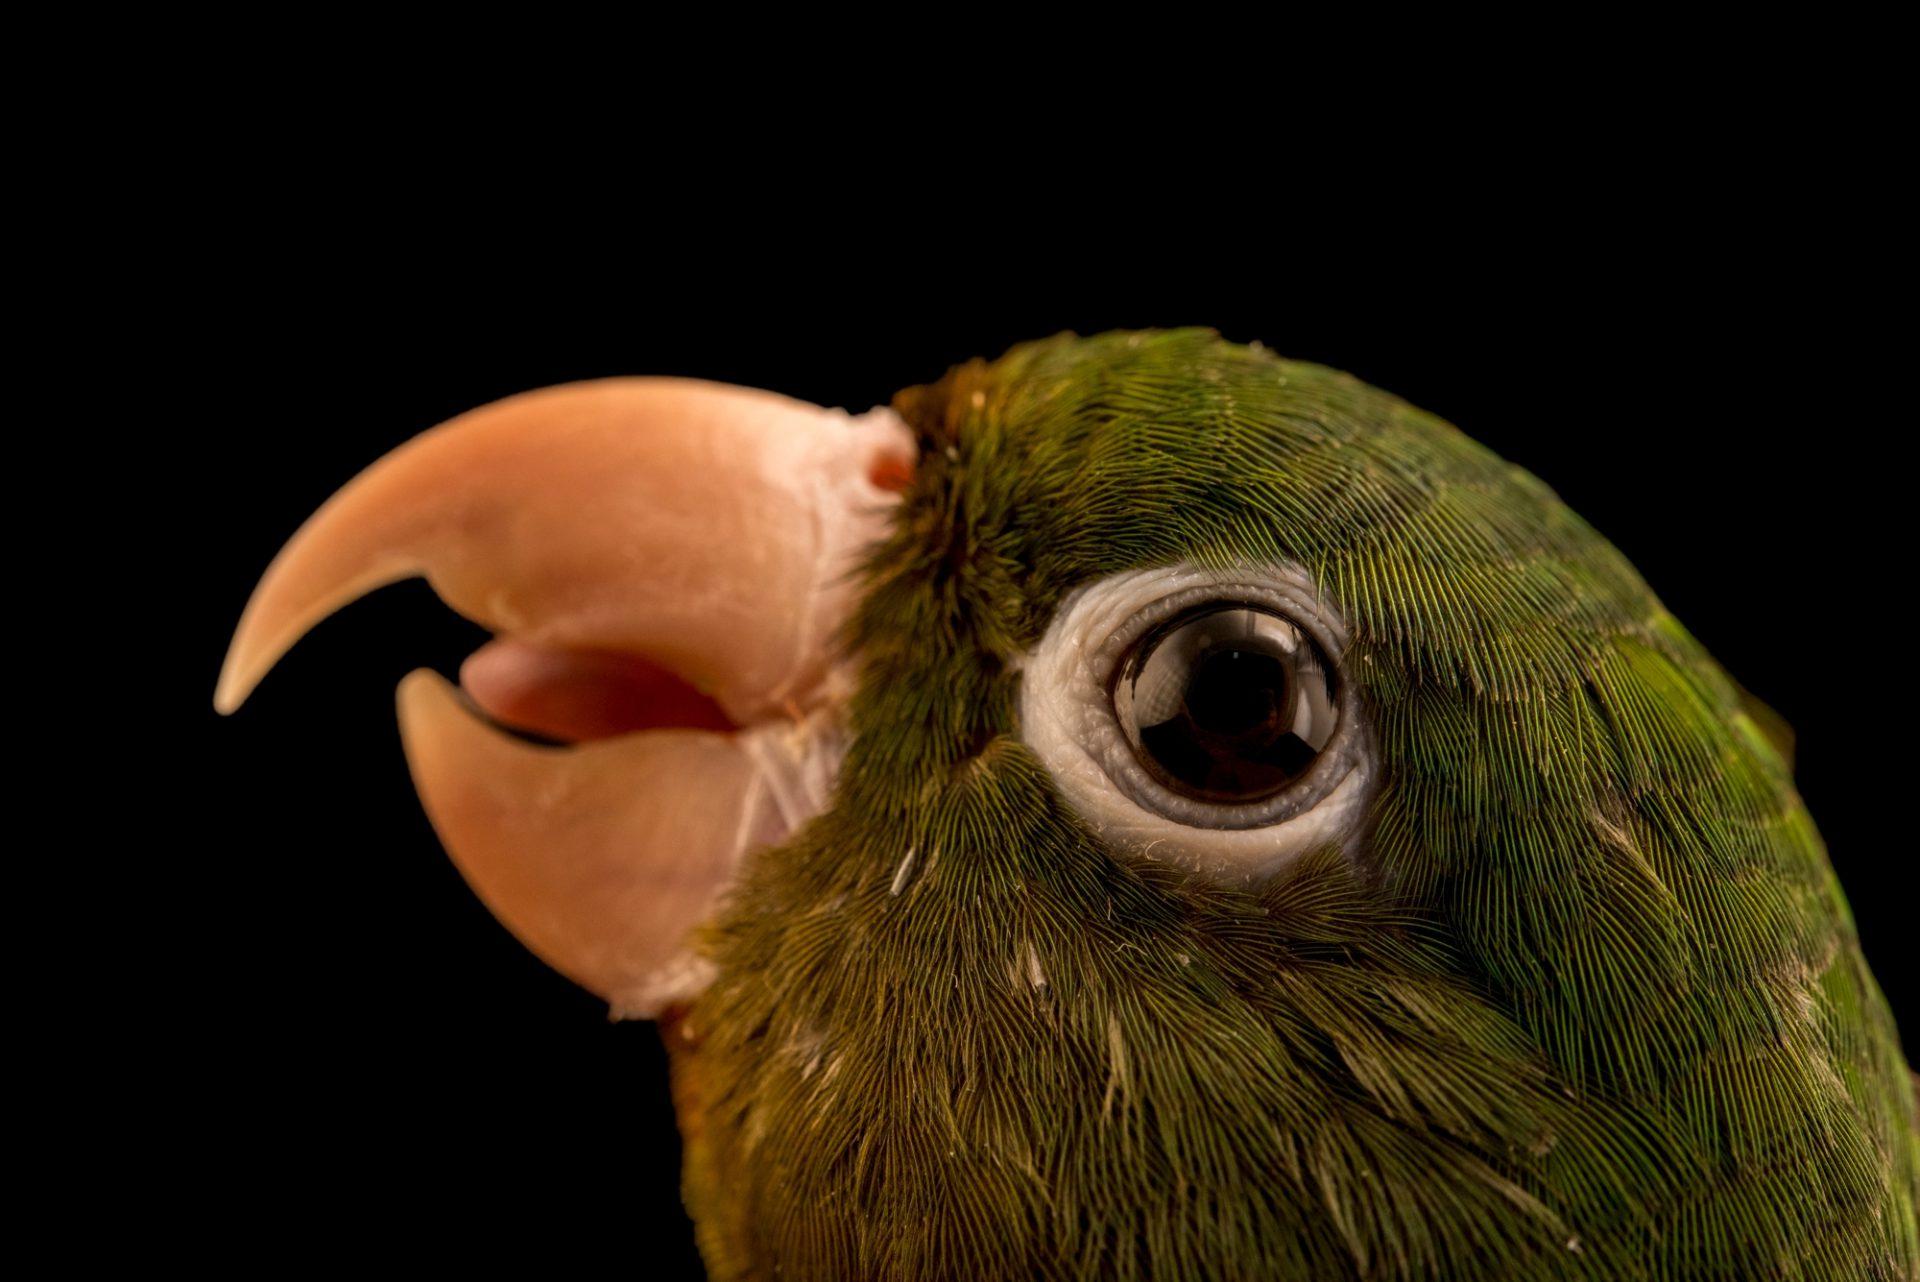 Photo: Golden winged parakeet, Brotogeris chrysoptera chrysoptera, at Loro Parque Fundacion.